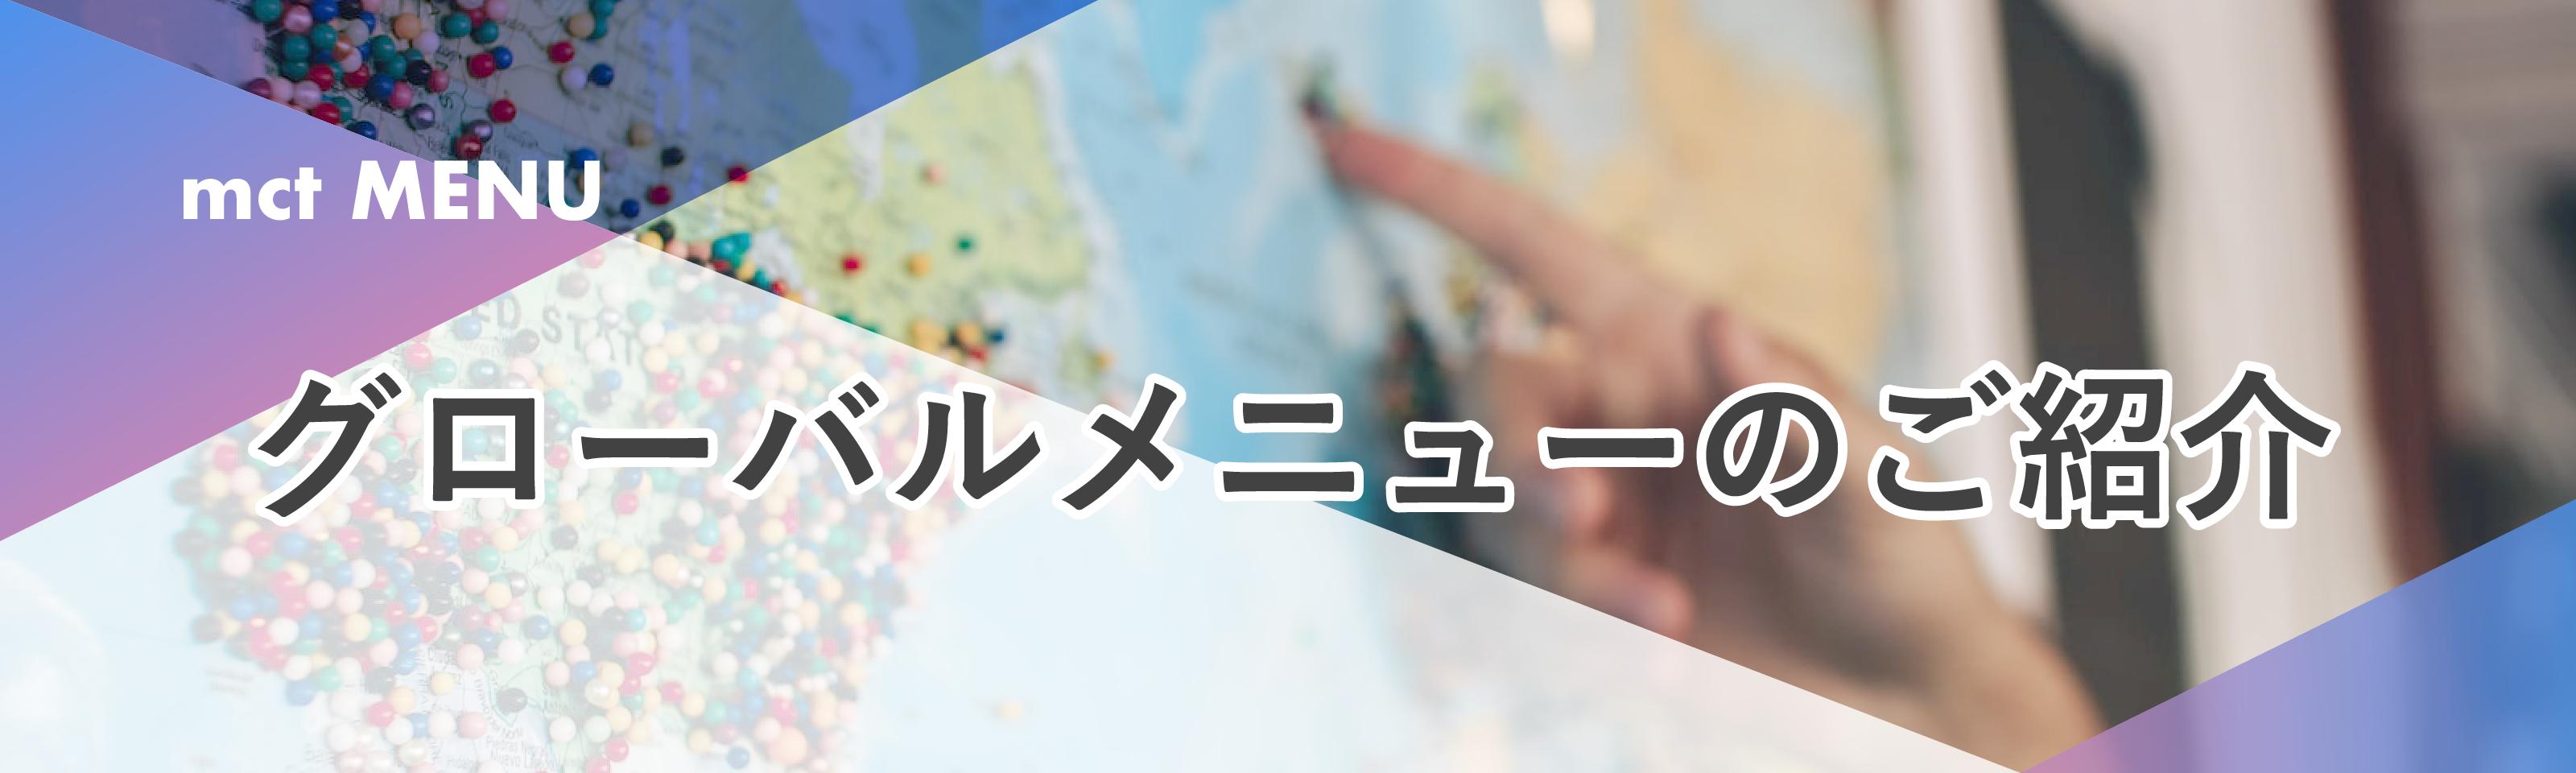 Menu|グローバルメニューのご紹介